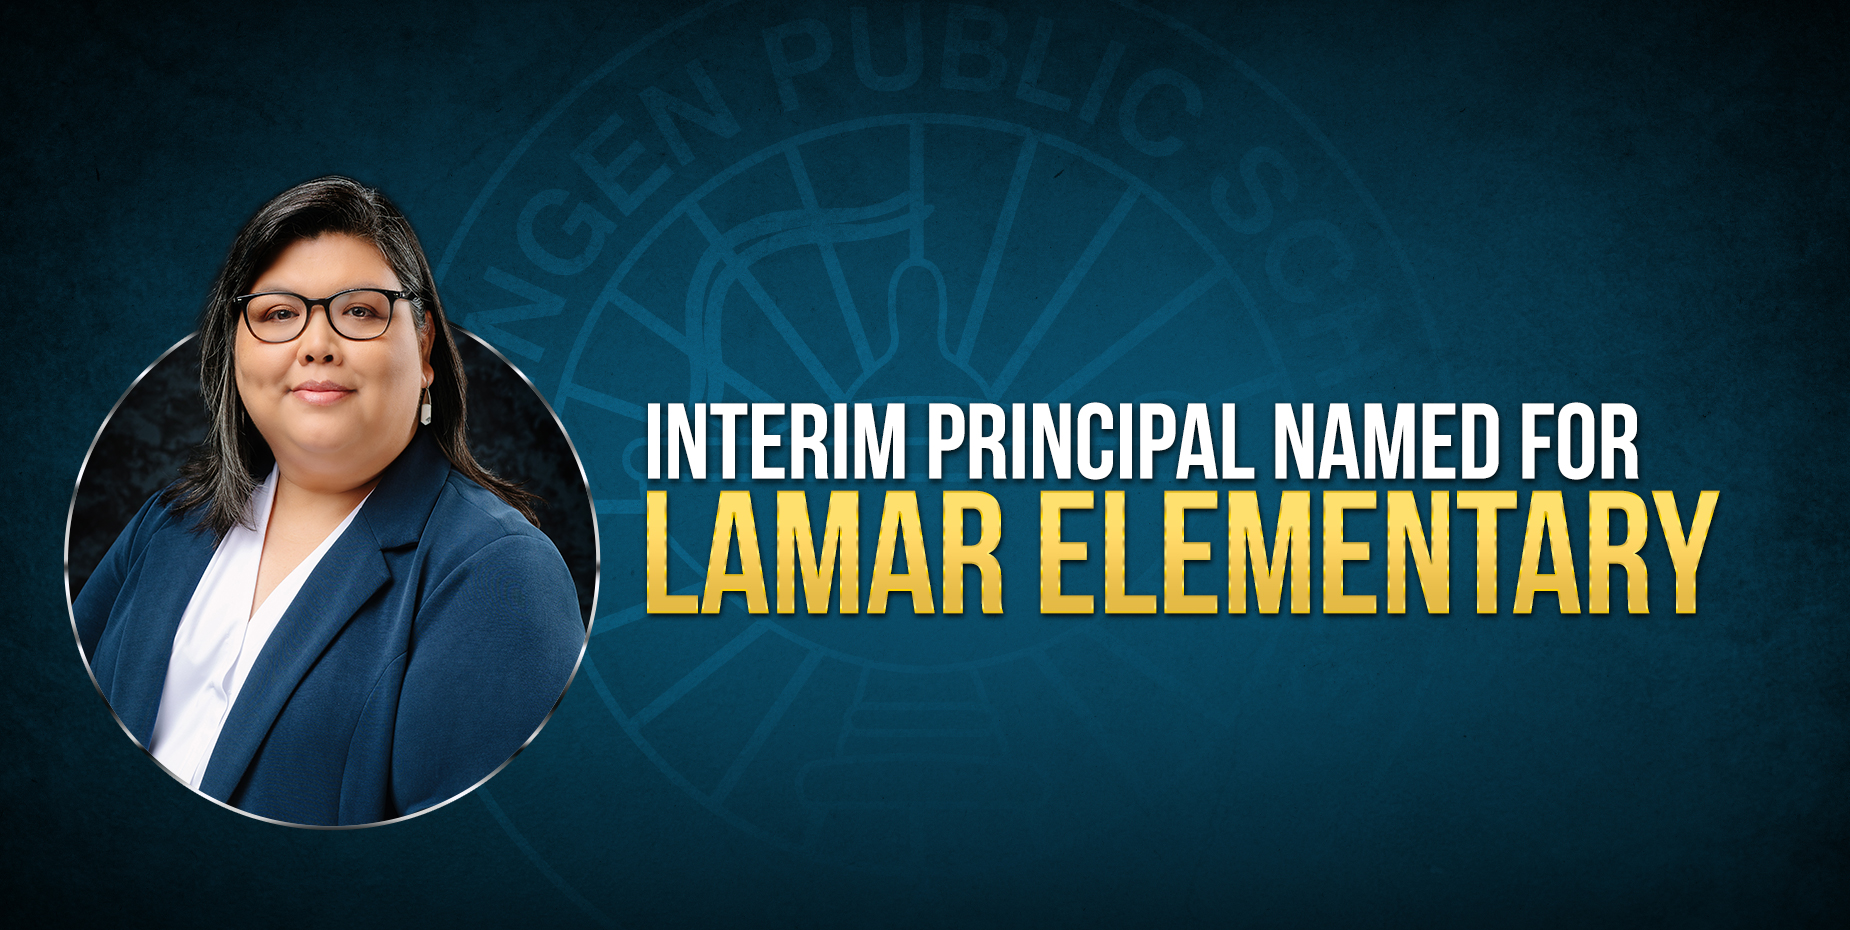 Ha sido nombrada la directora interina para la Primaria Lamar.